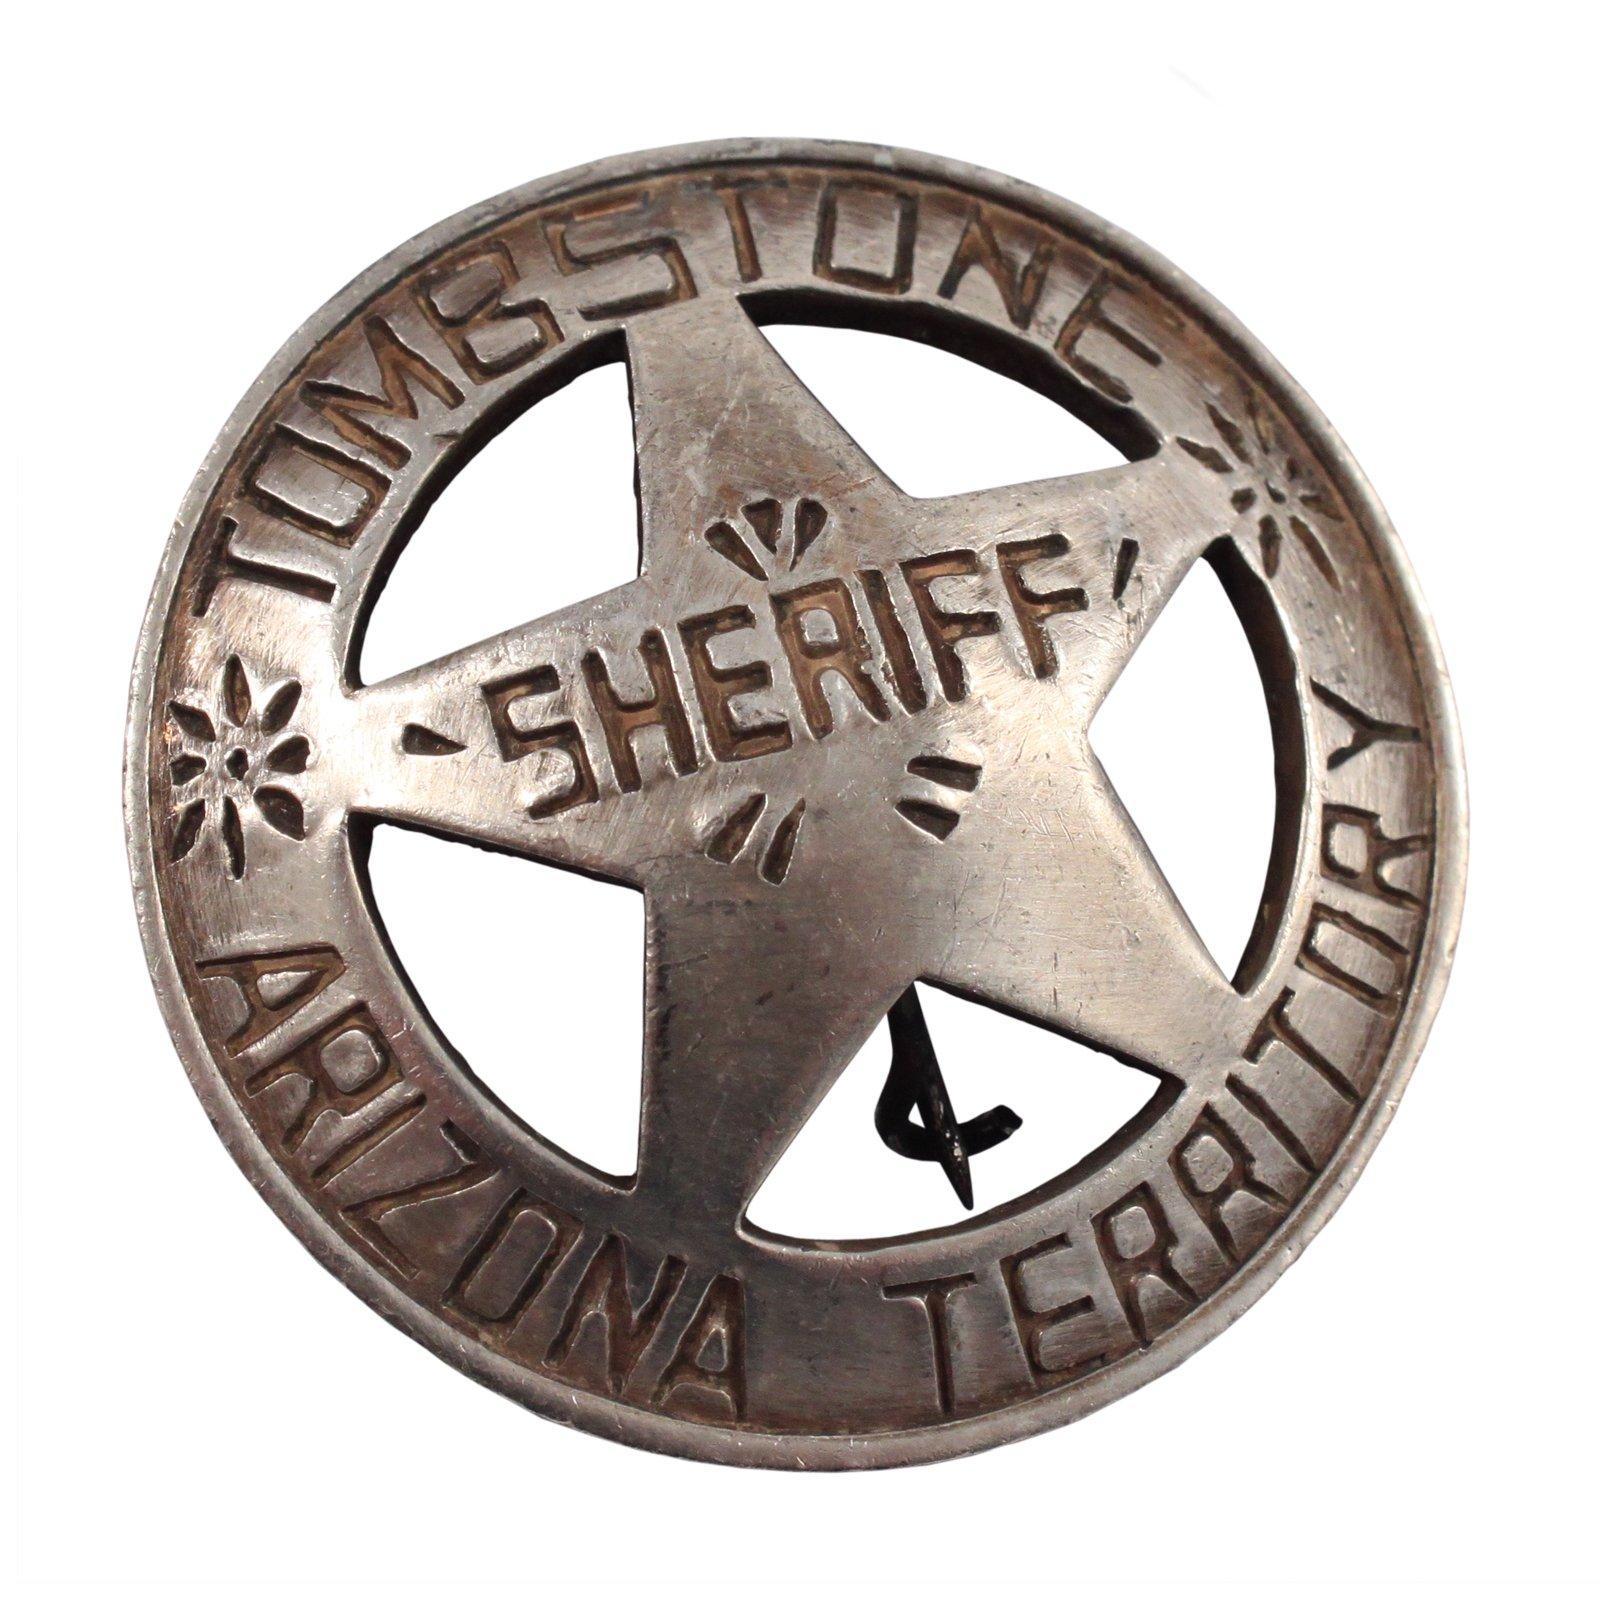 Arizona Territory Tombstone Sheriff Old West Badge